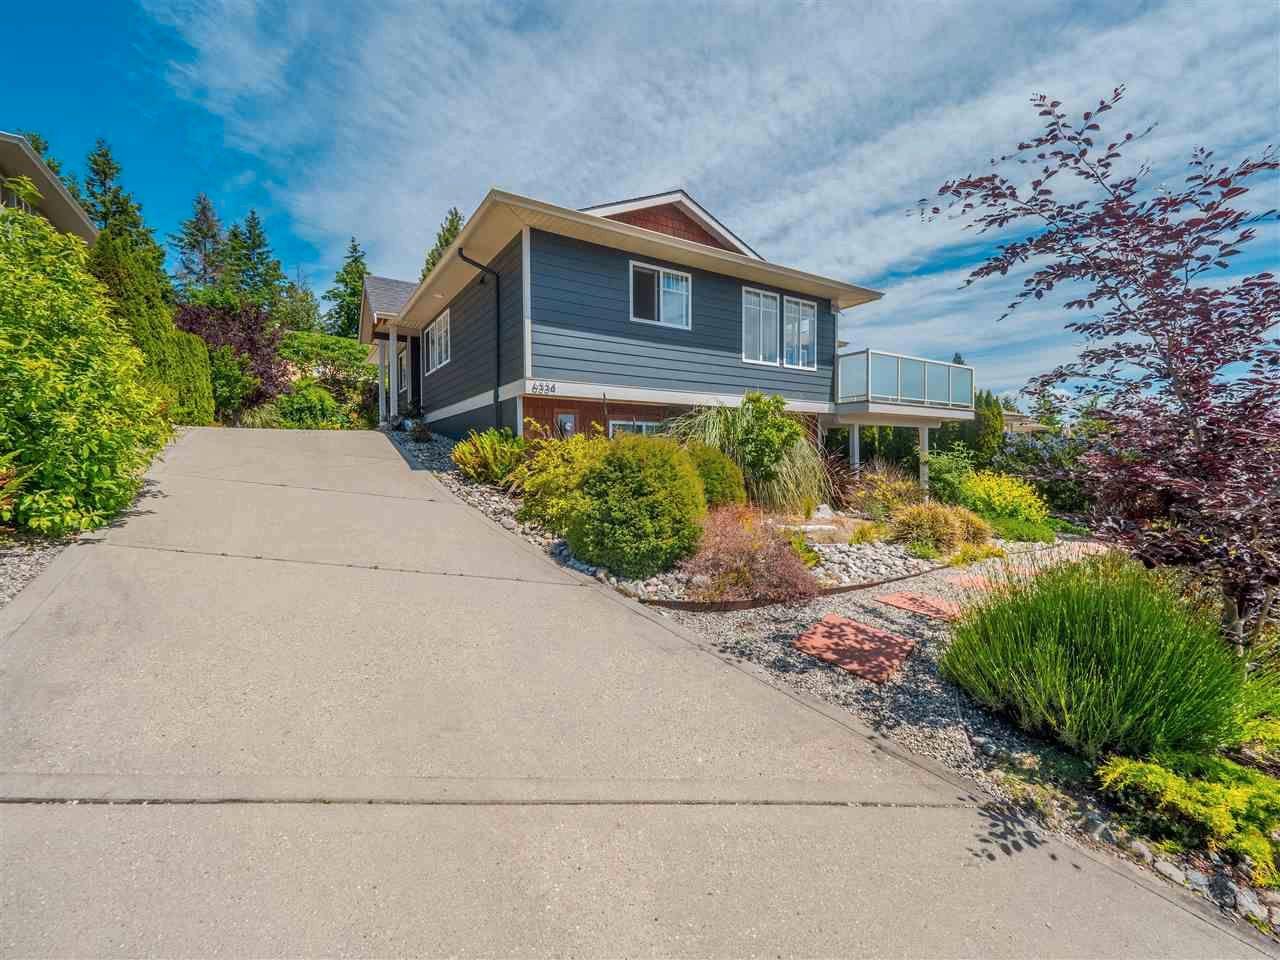 Main Photo: 6334 SAMRON Road in Sechelt: Sechelt District House for sale (Sunshine Coast)  : MLS®# R2589104